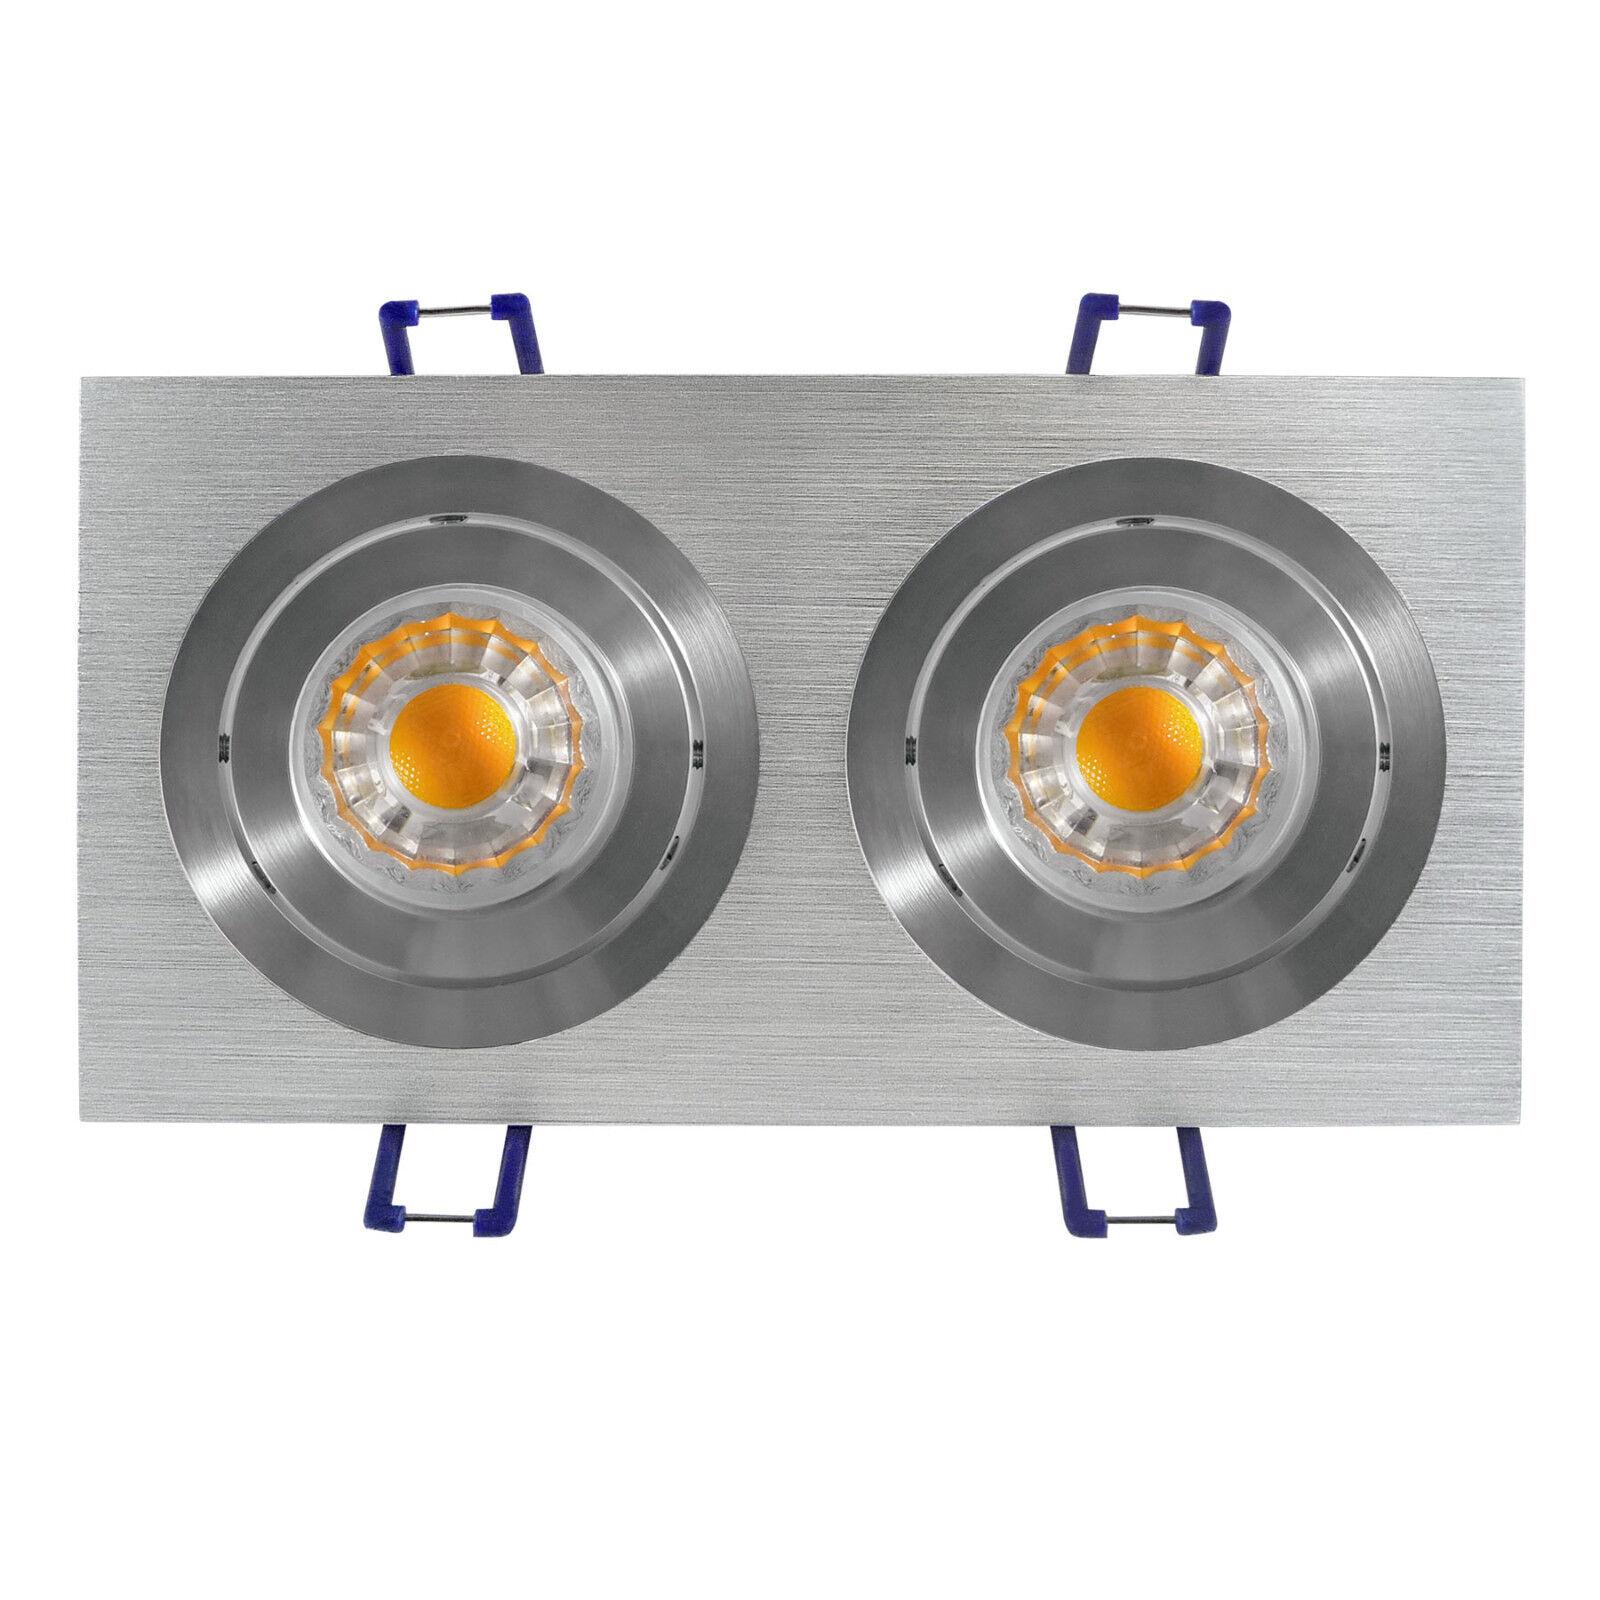 LED montaje techo lámpara LED emisor mantas instalación emisor LED gu10-Oberon 2 x 6 vatios 540 LM 4fd925